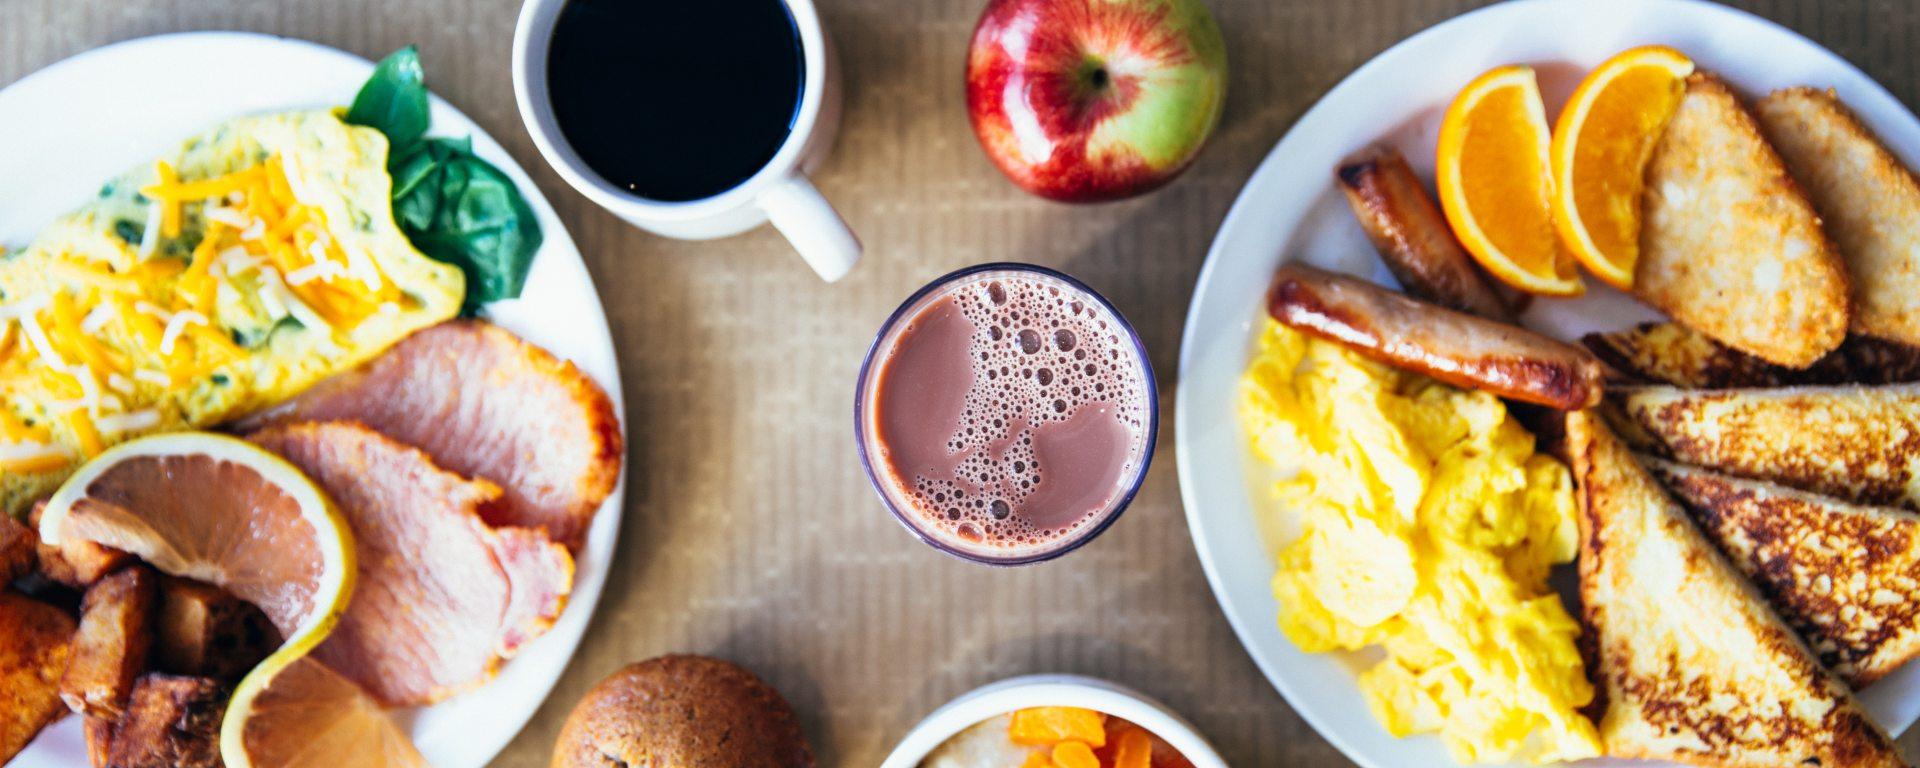 table full of breakfast foods